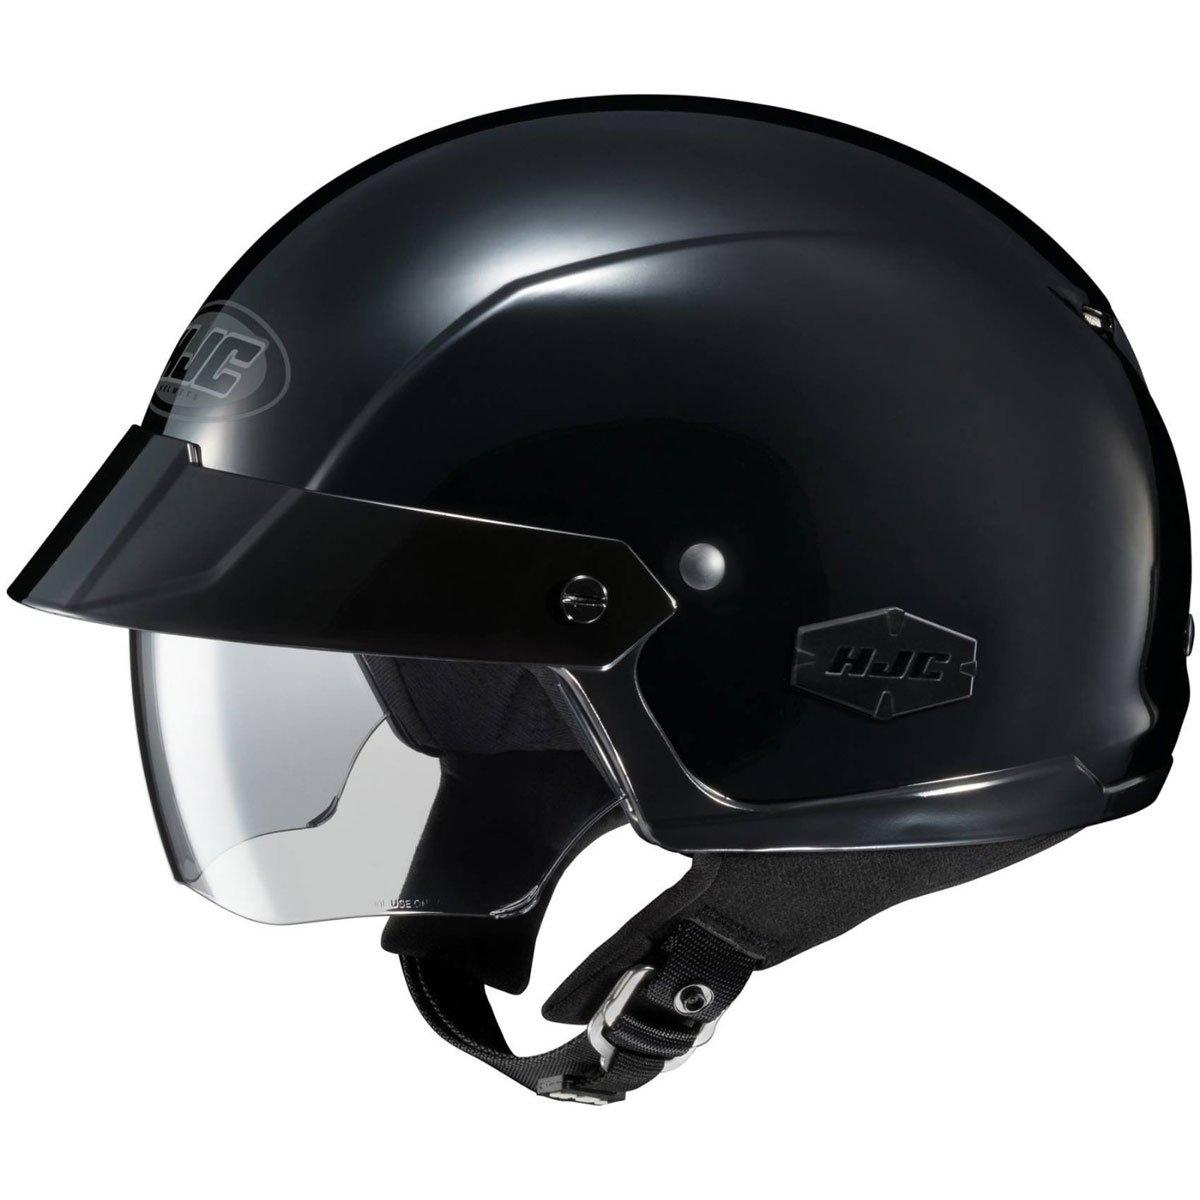 HJC Solid IS-Cruiser Half (1/2) Shell Motorcycle Helmet - Black / 2X-Large